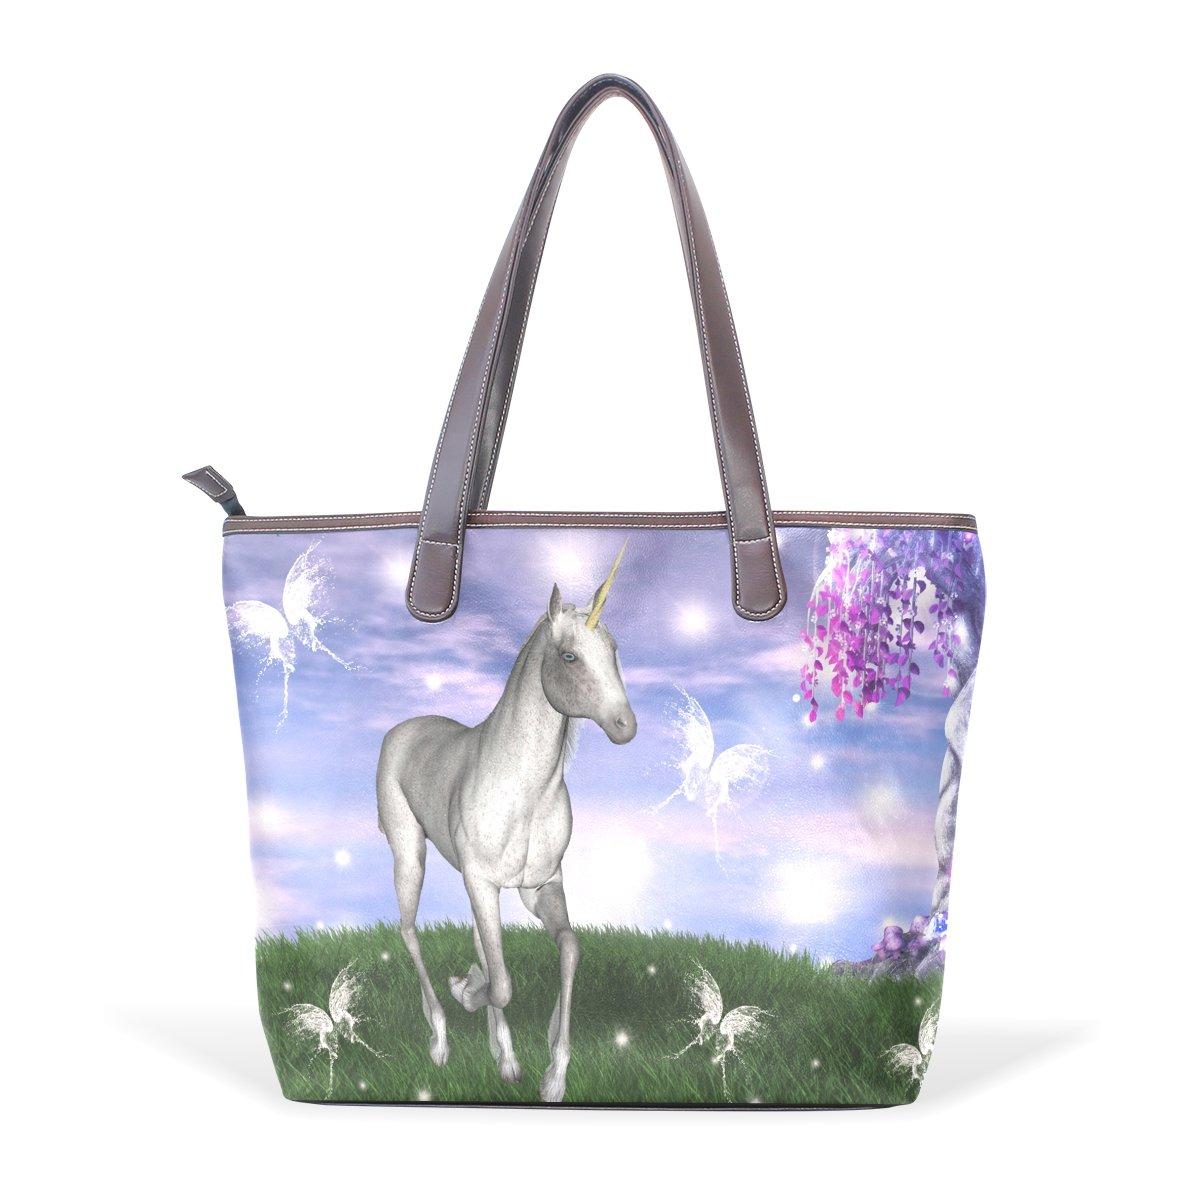 Sunlome Unicorn In An Enchanted Meadow Pattern Handbags For Women Girls PU Leather Shoulder Tote Bag